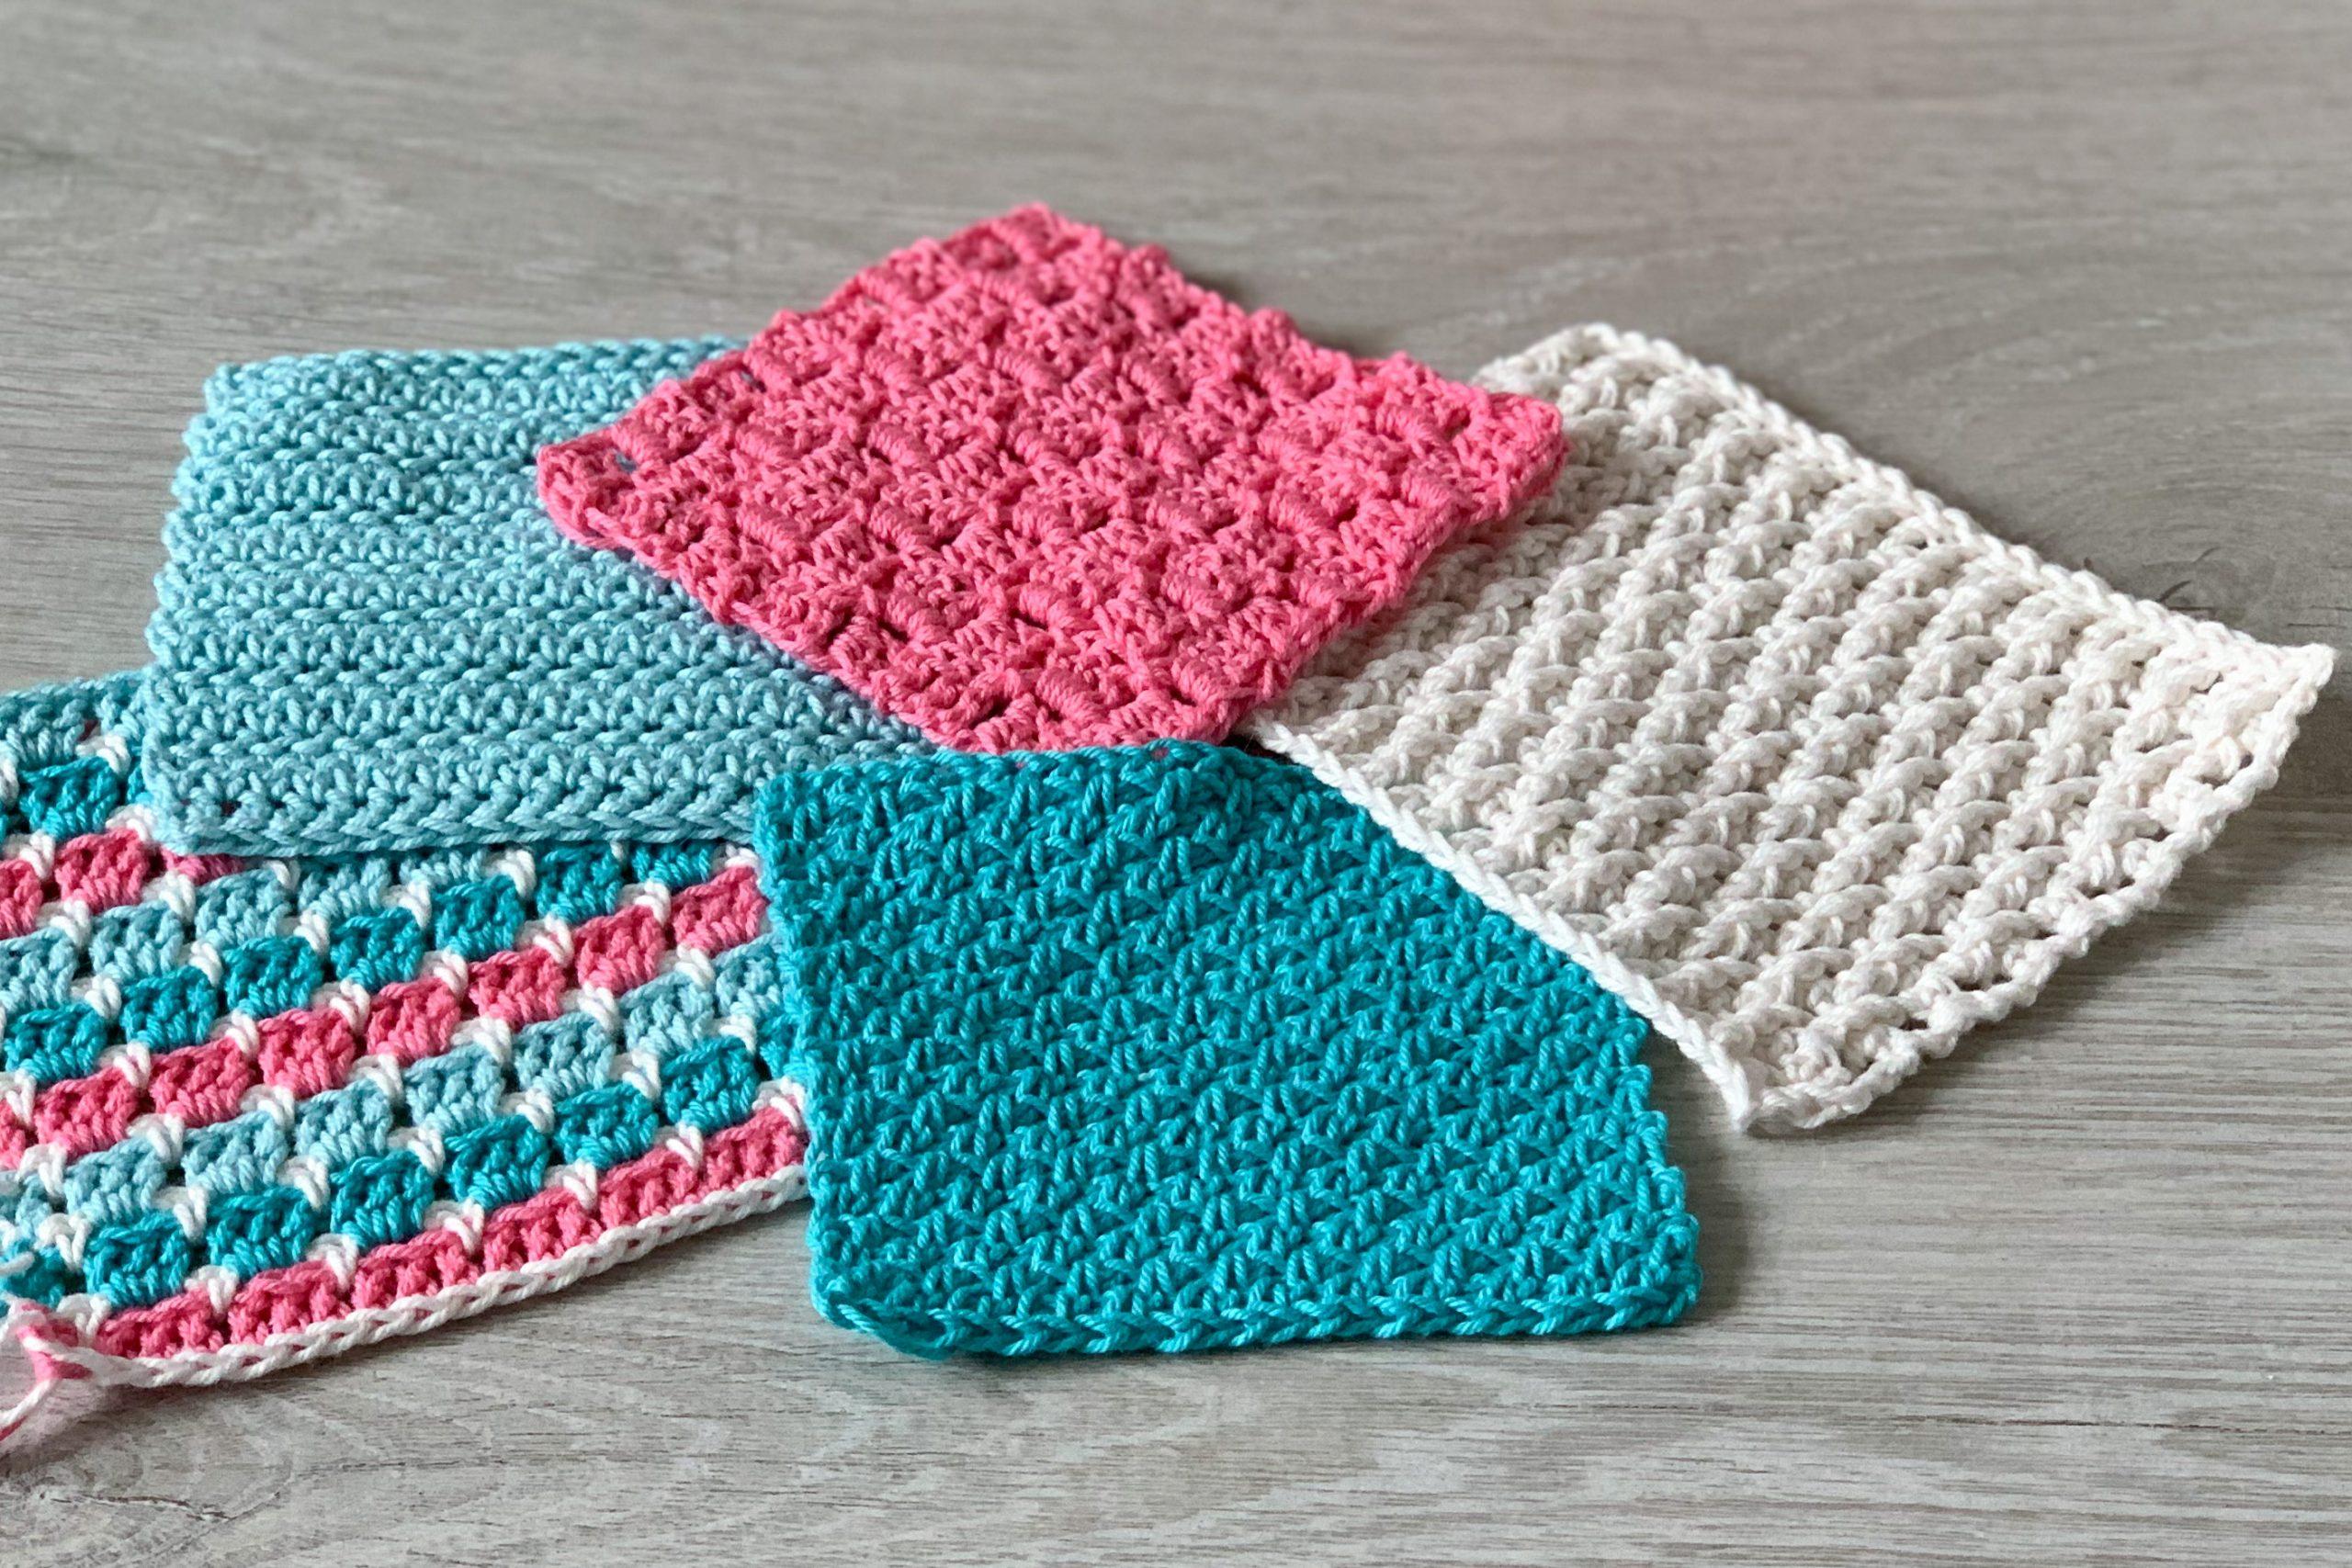 5 mindful crochet stitch swatches